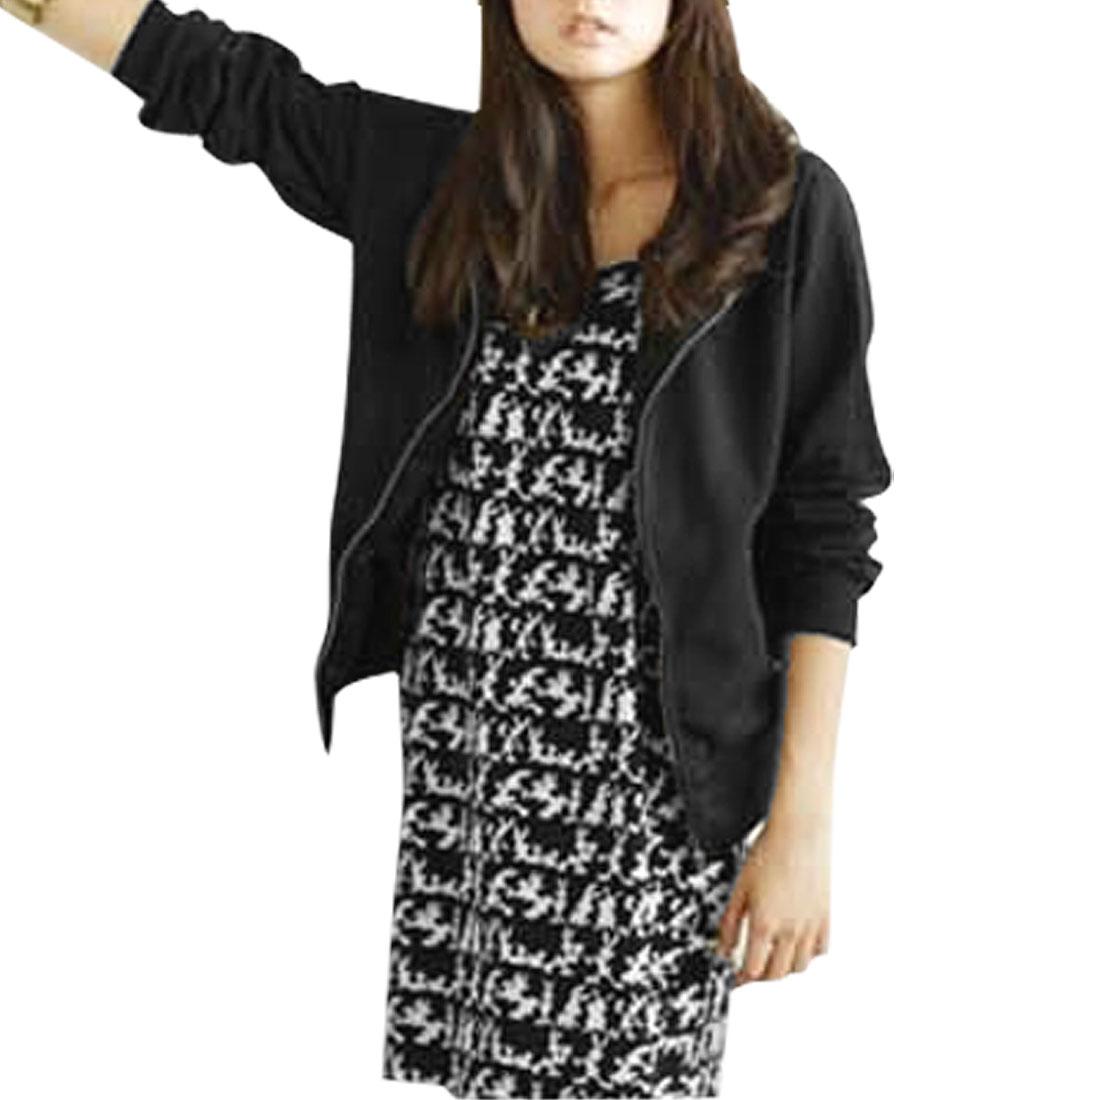 Ladies Full Zipper Slant Pockets Ribbed Cuffs Hoodie Sweatshirt Black XS